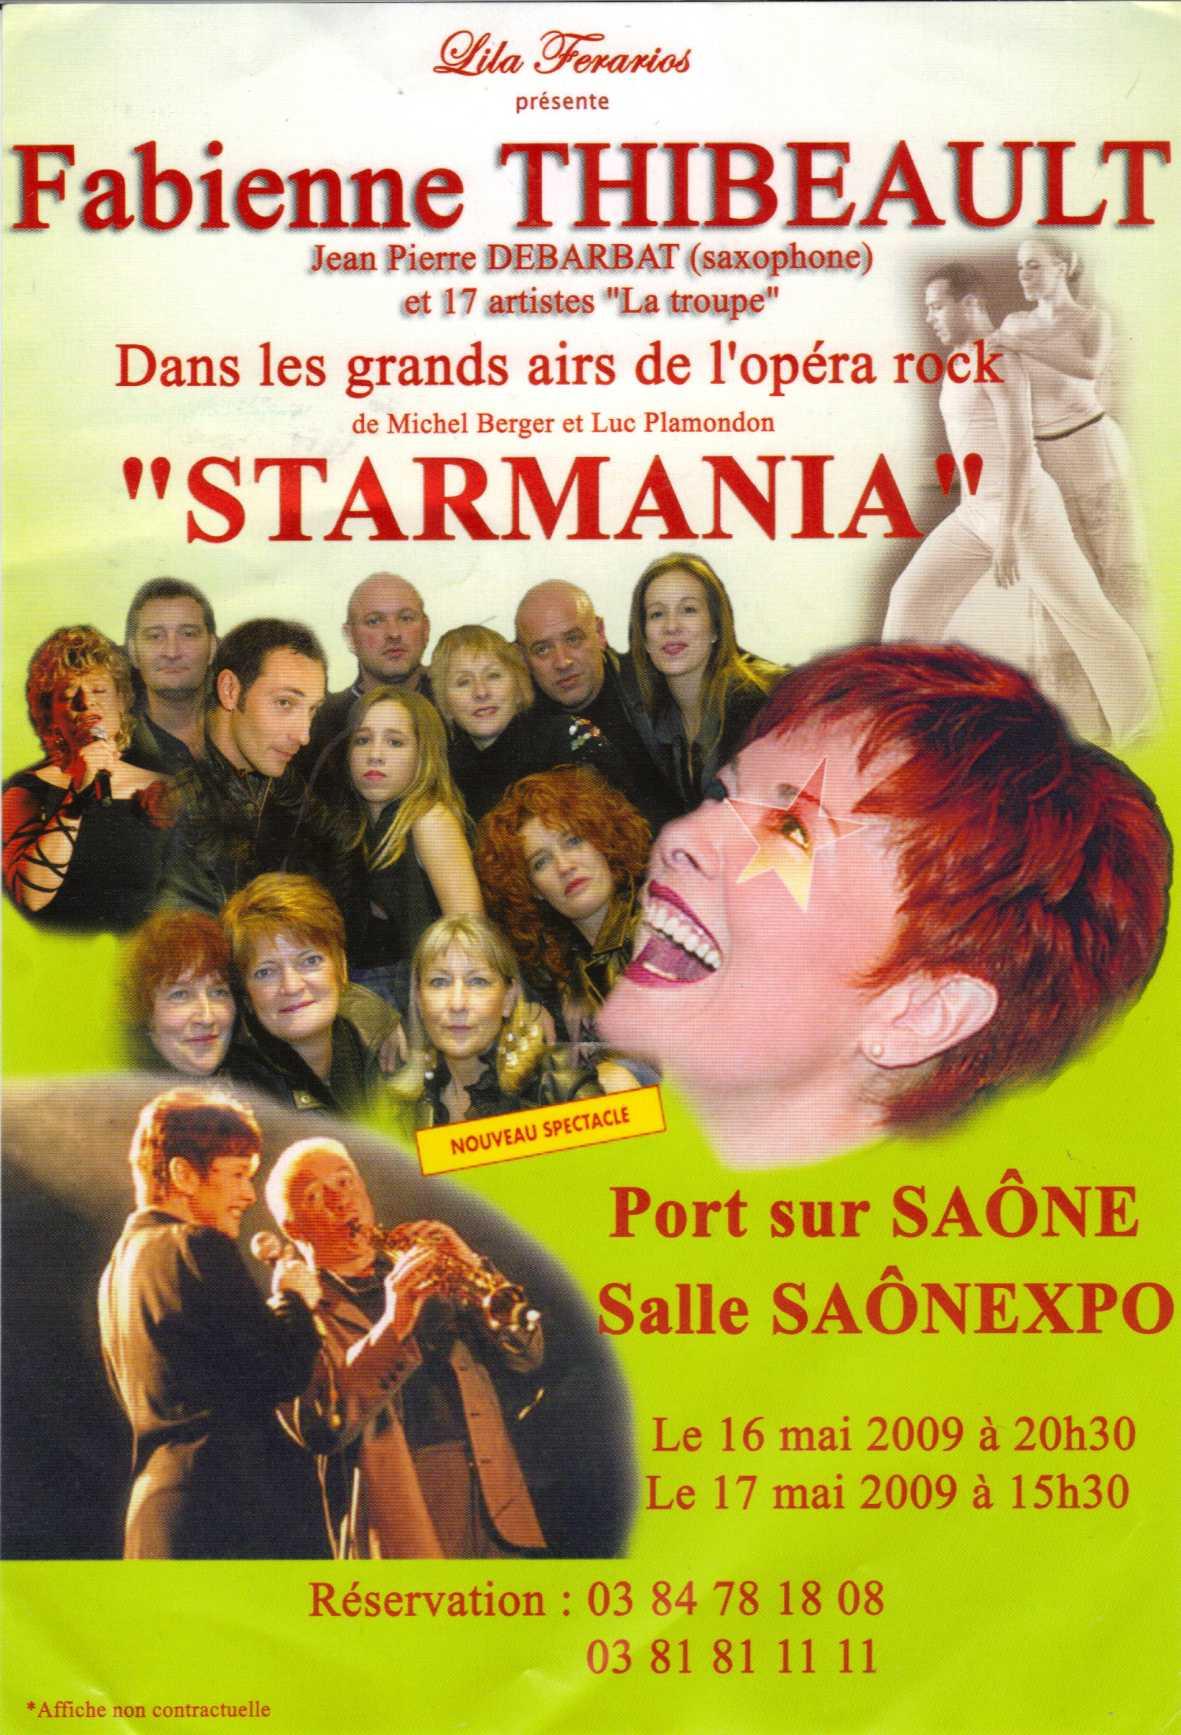 Le monde est Stone à PORT SUR SAONE (70) – STARMANIA à SAONEXPO